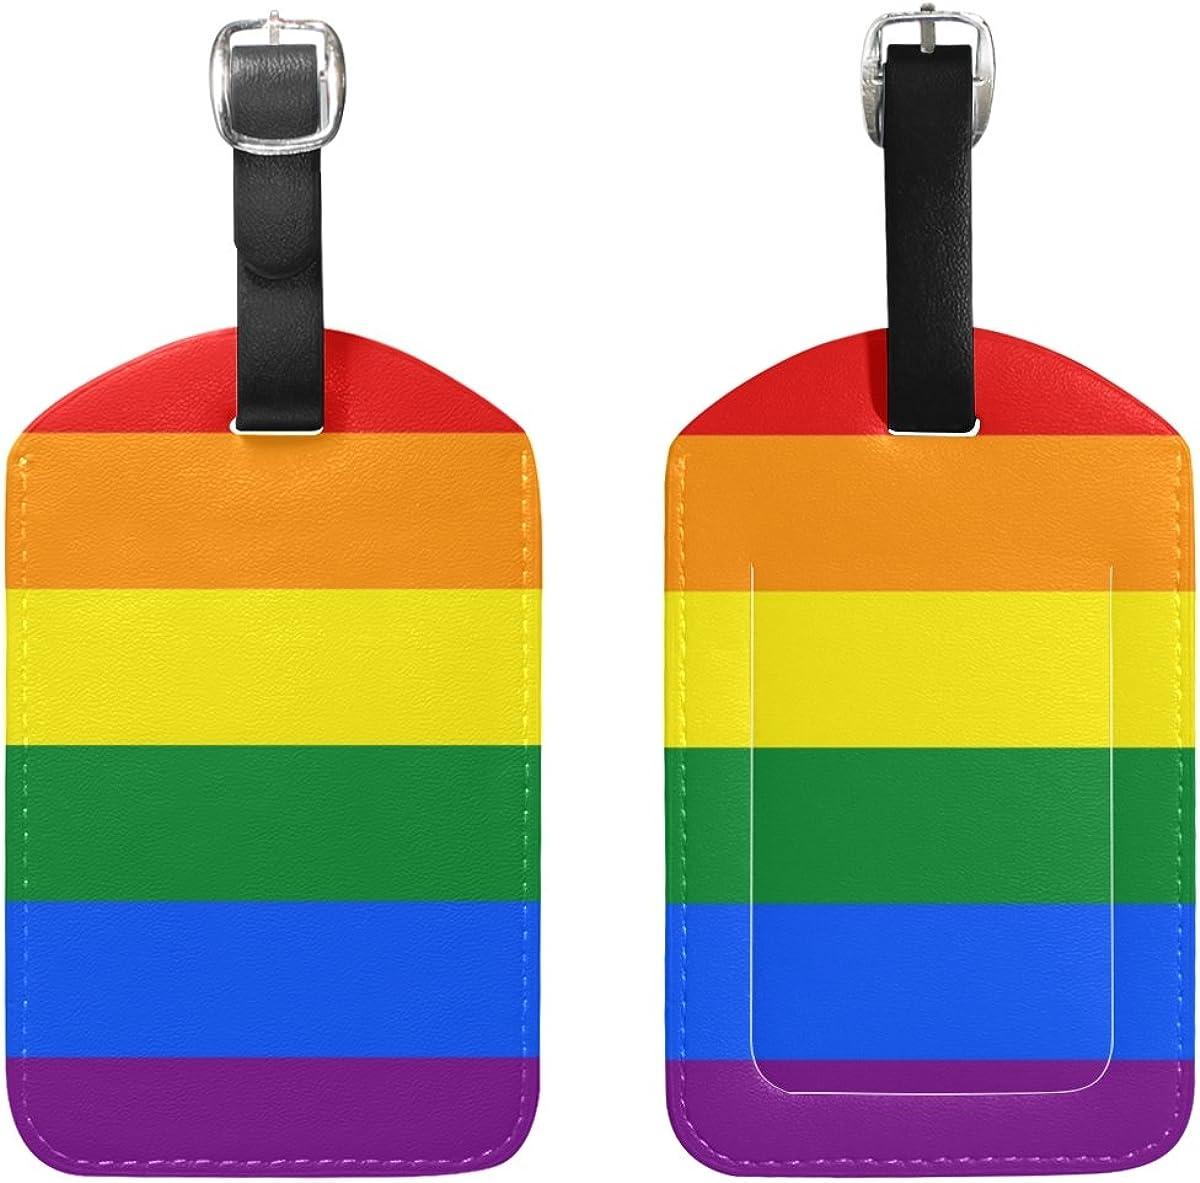 Saobao Travel Luggage Tag Rainbow And Unicorn PU Leather Baggage Suitcase Travel ID Bag Tag 1Pcs